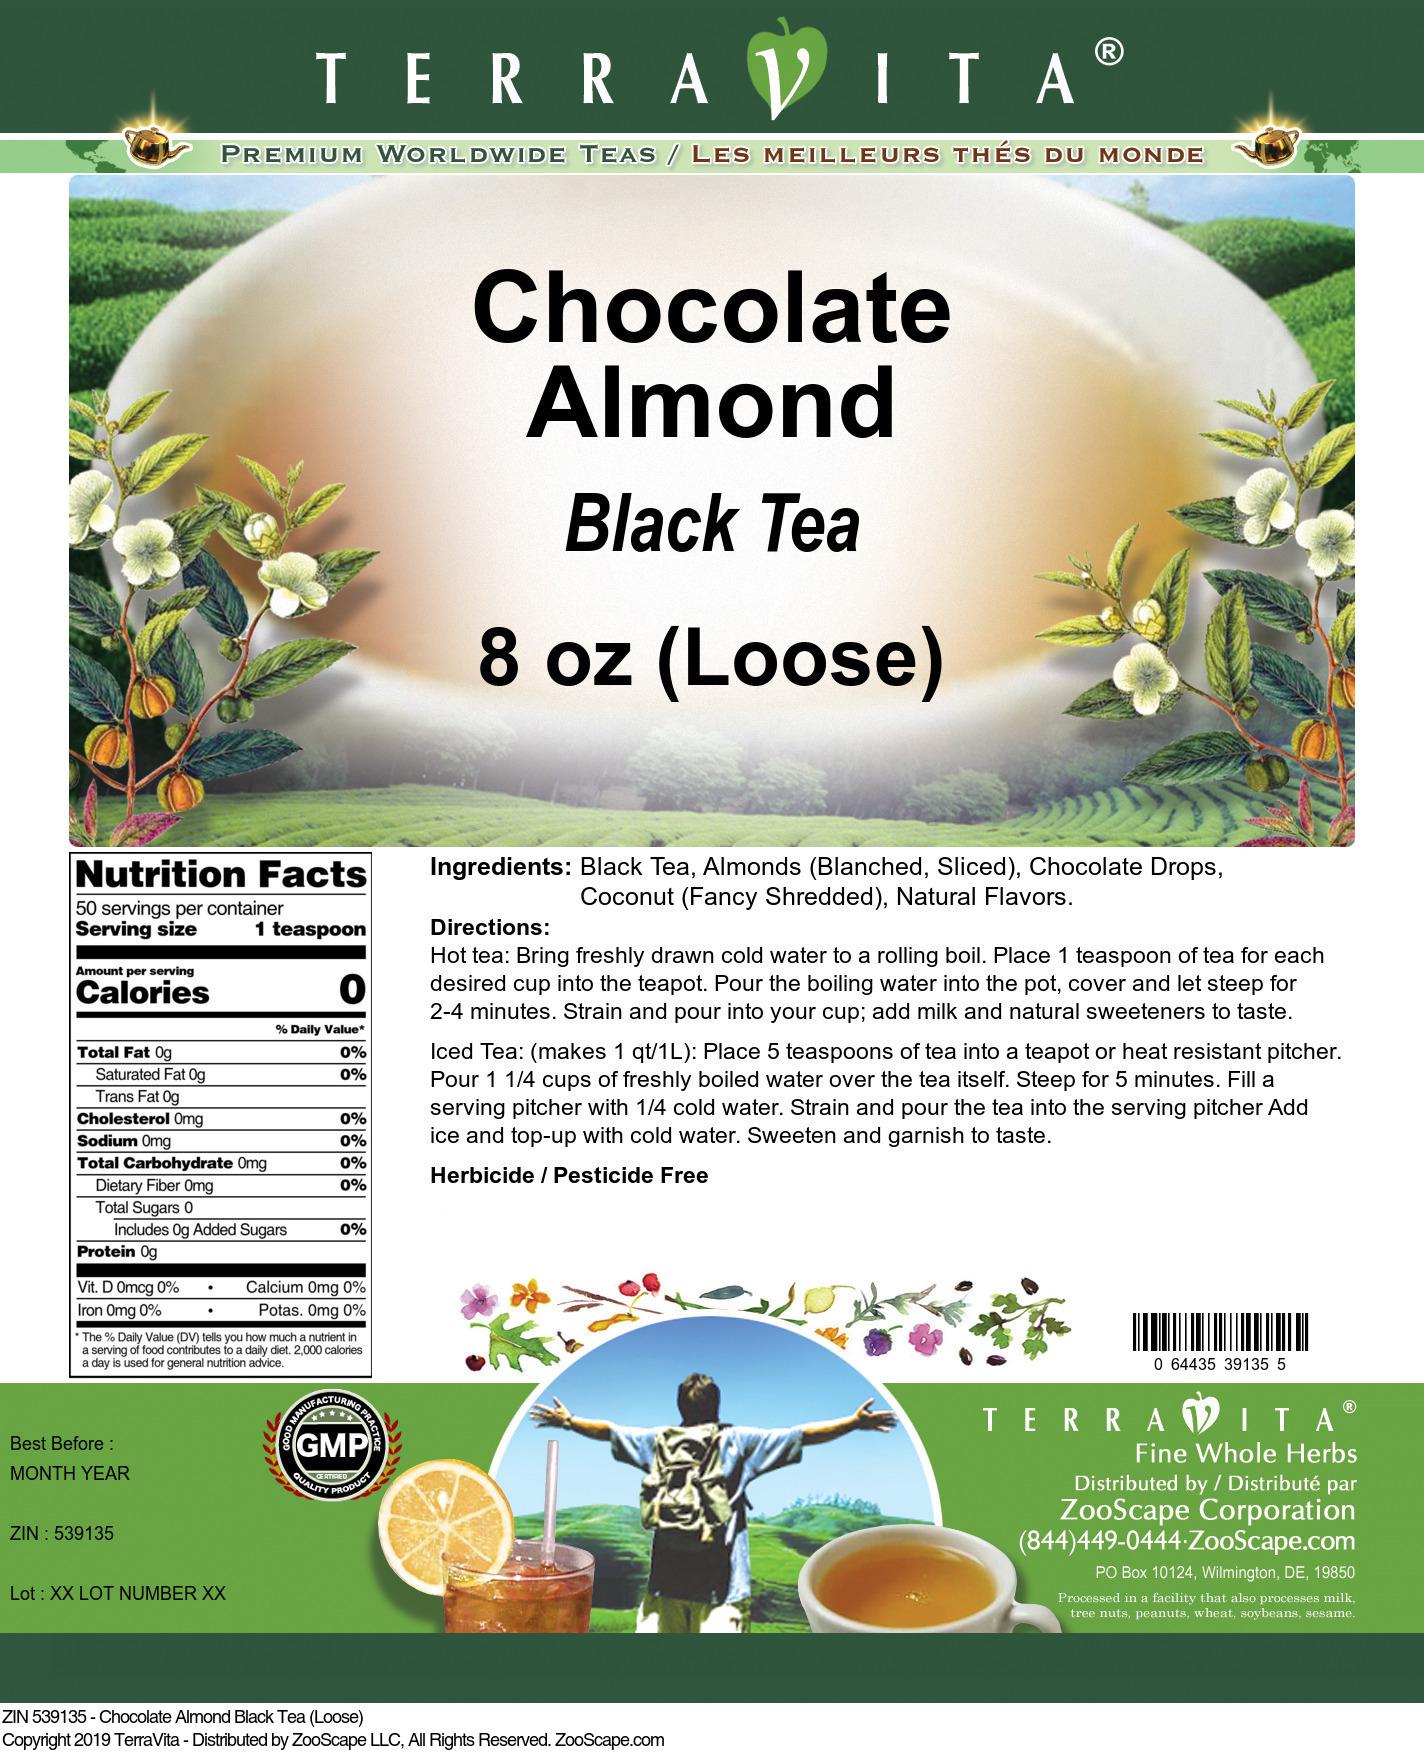 Chocolate Almond Black Tea